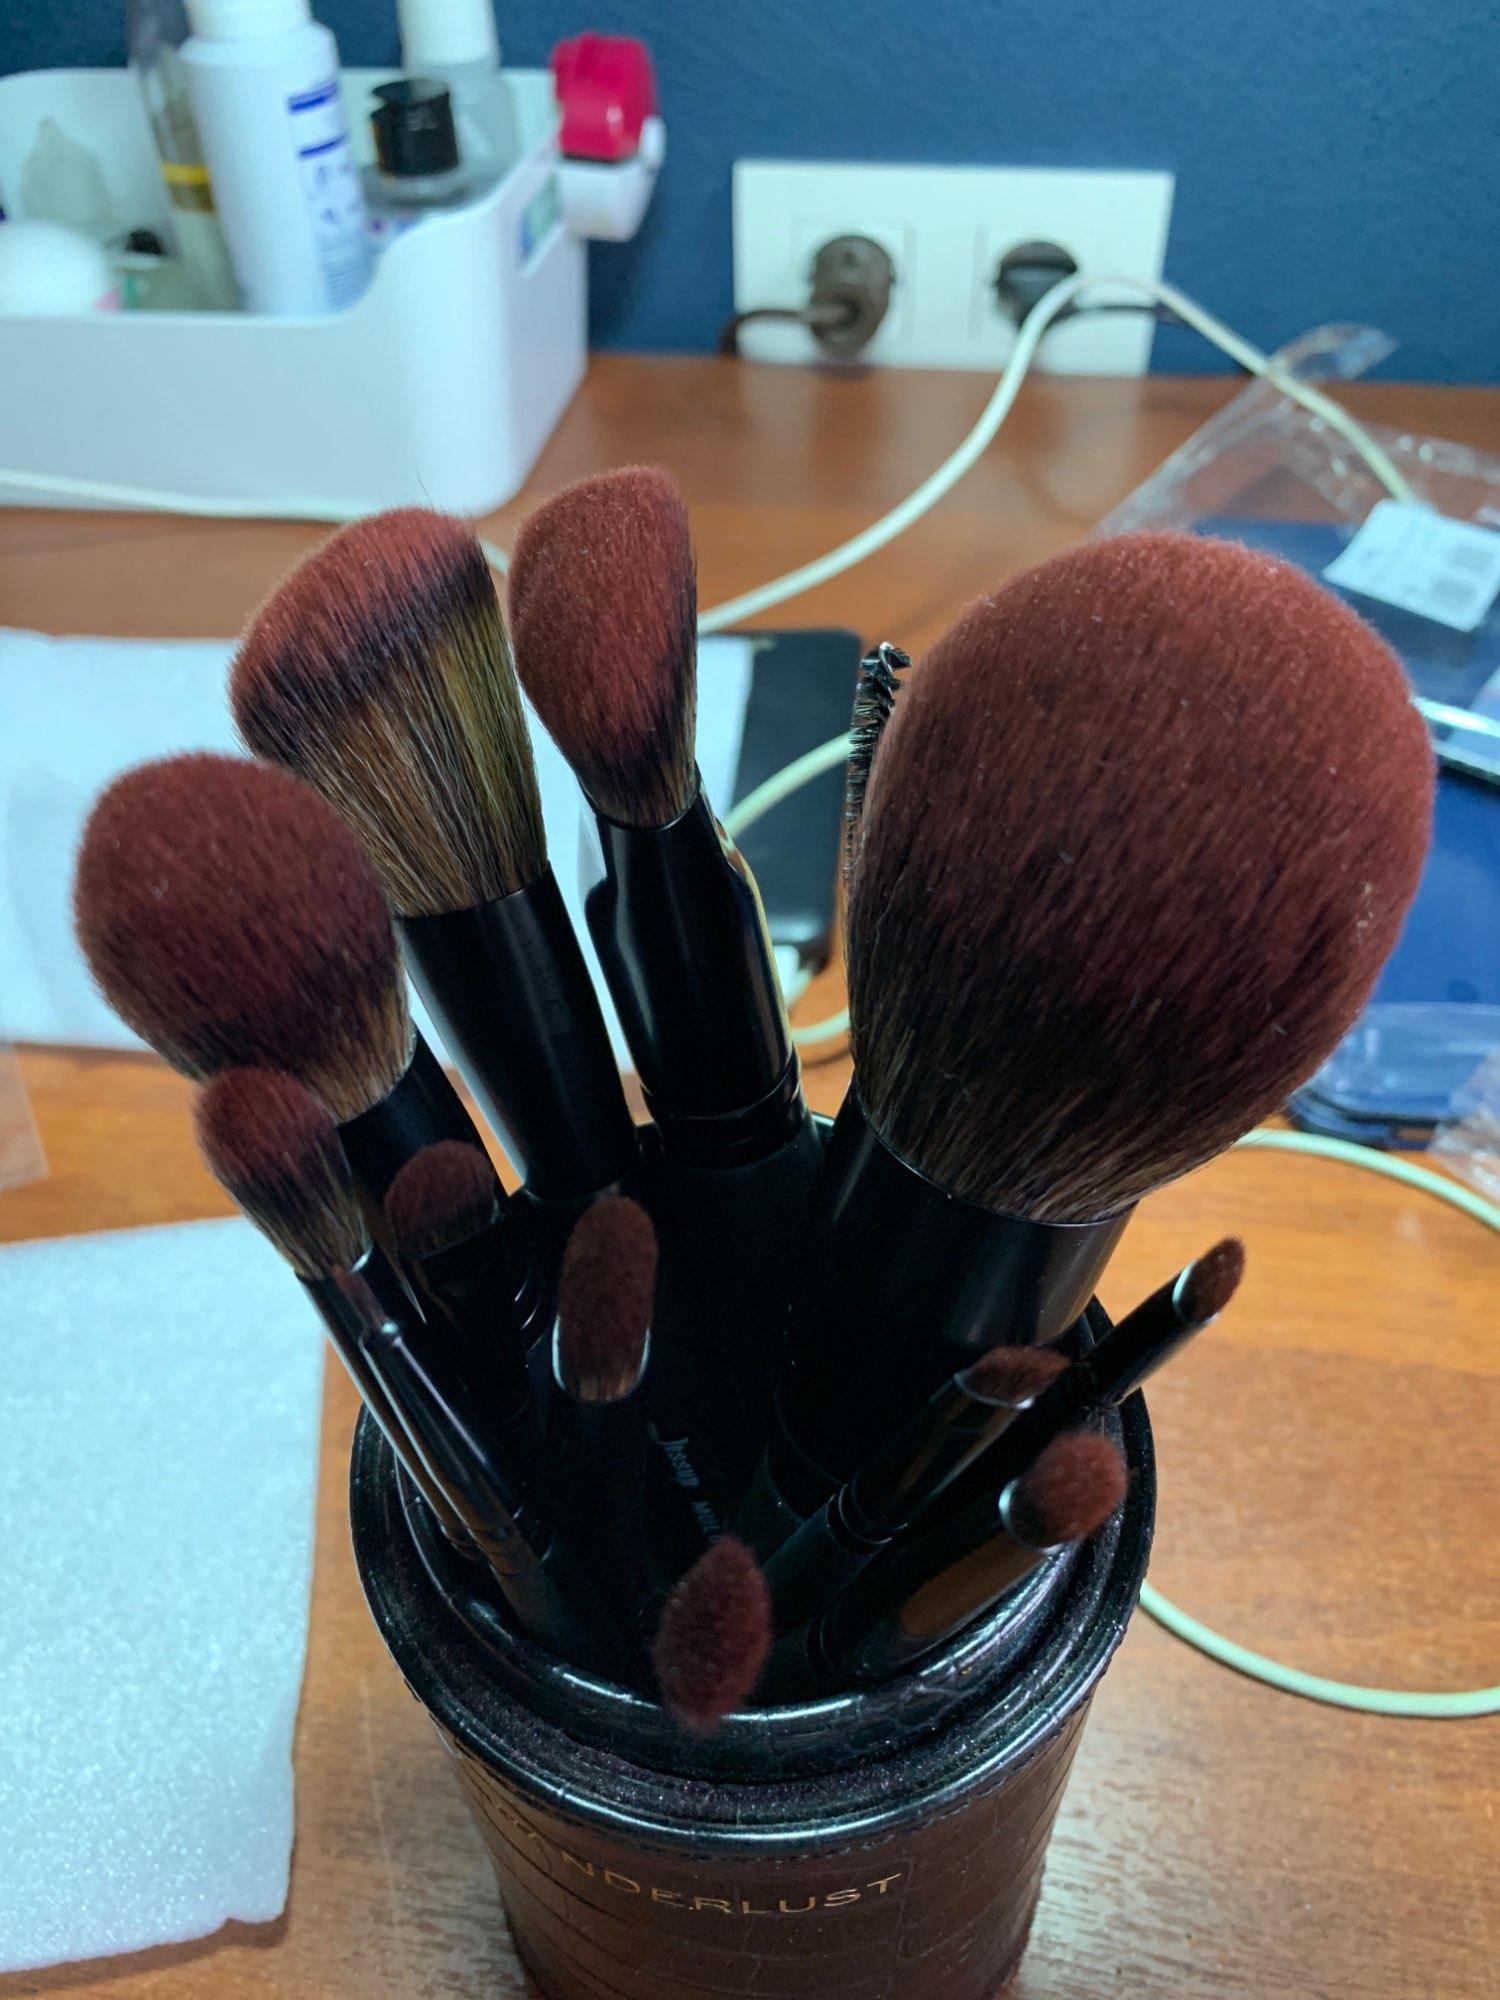 Jessup New Arrival Makeup brushes brushes Phantom Black 3-21pcs Foundation brush Powder Concealer Eyeshadow Synthetic hair reviews №1 337676